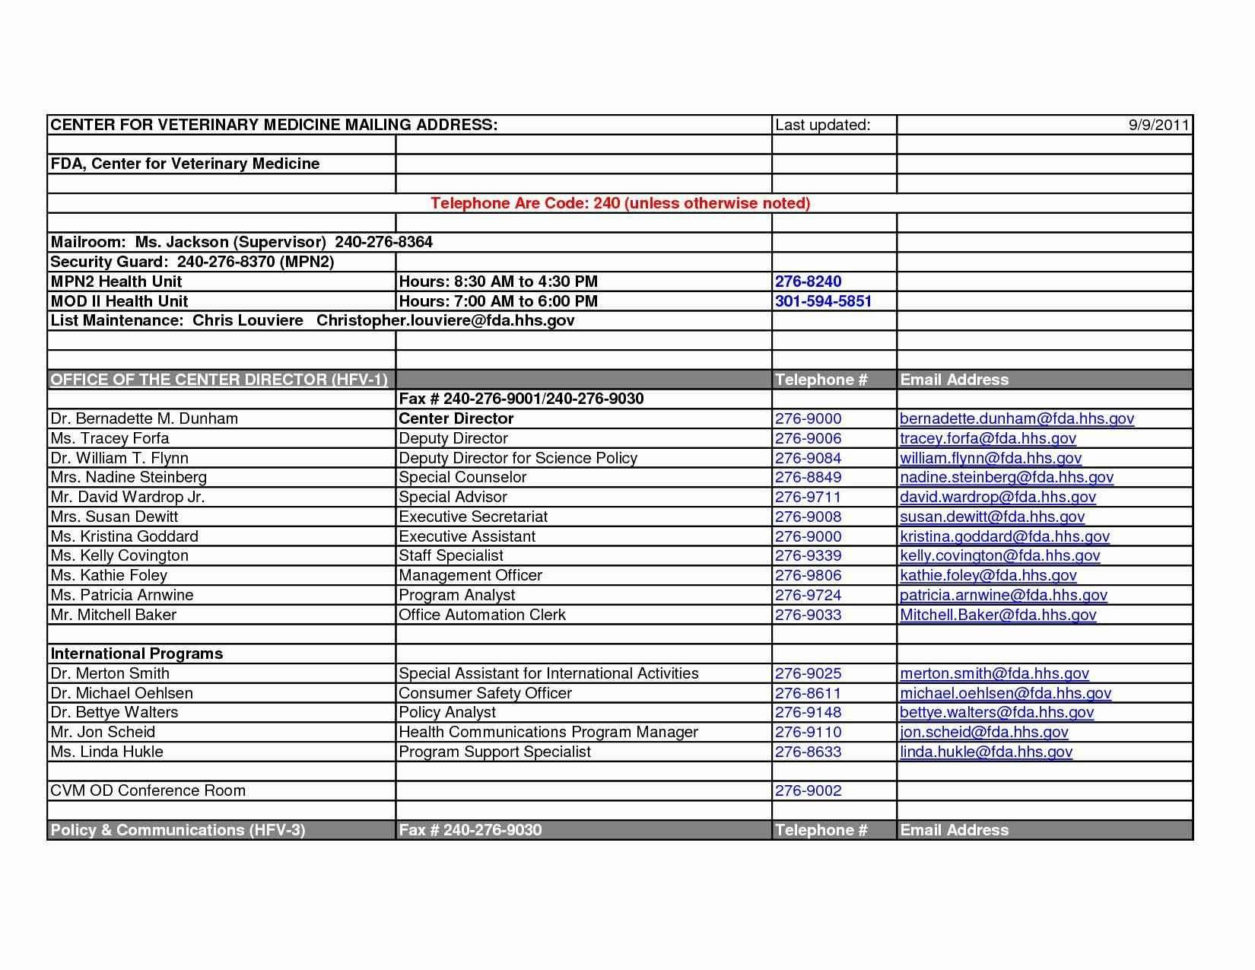 Rocket League Spreadsheet Prices Xbox Within Rocket League Prices Spreadsheet  Readleaf Document